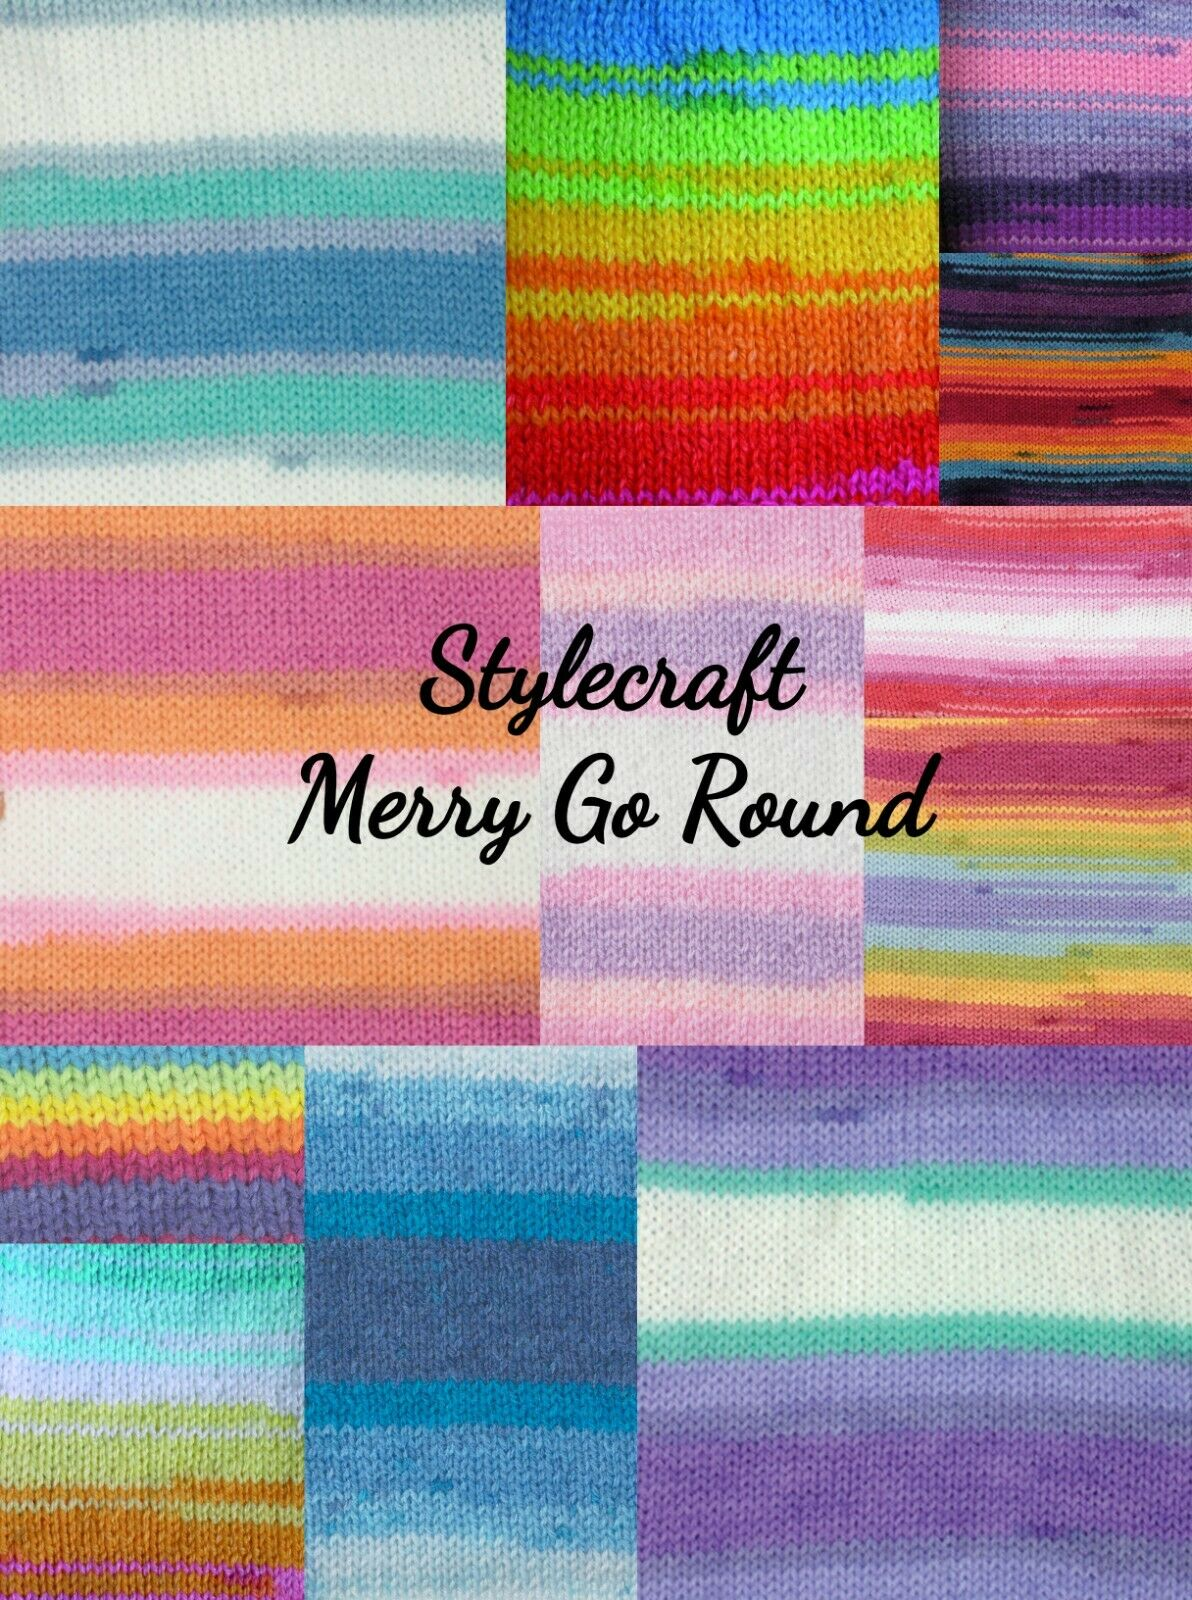 Yarn 100g Stylecraft Wondersoft DK Merry-go-Round Knitting Wool 3141 Strawberry